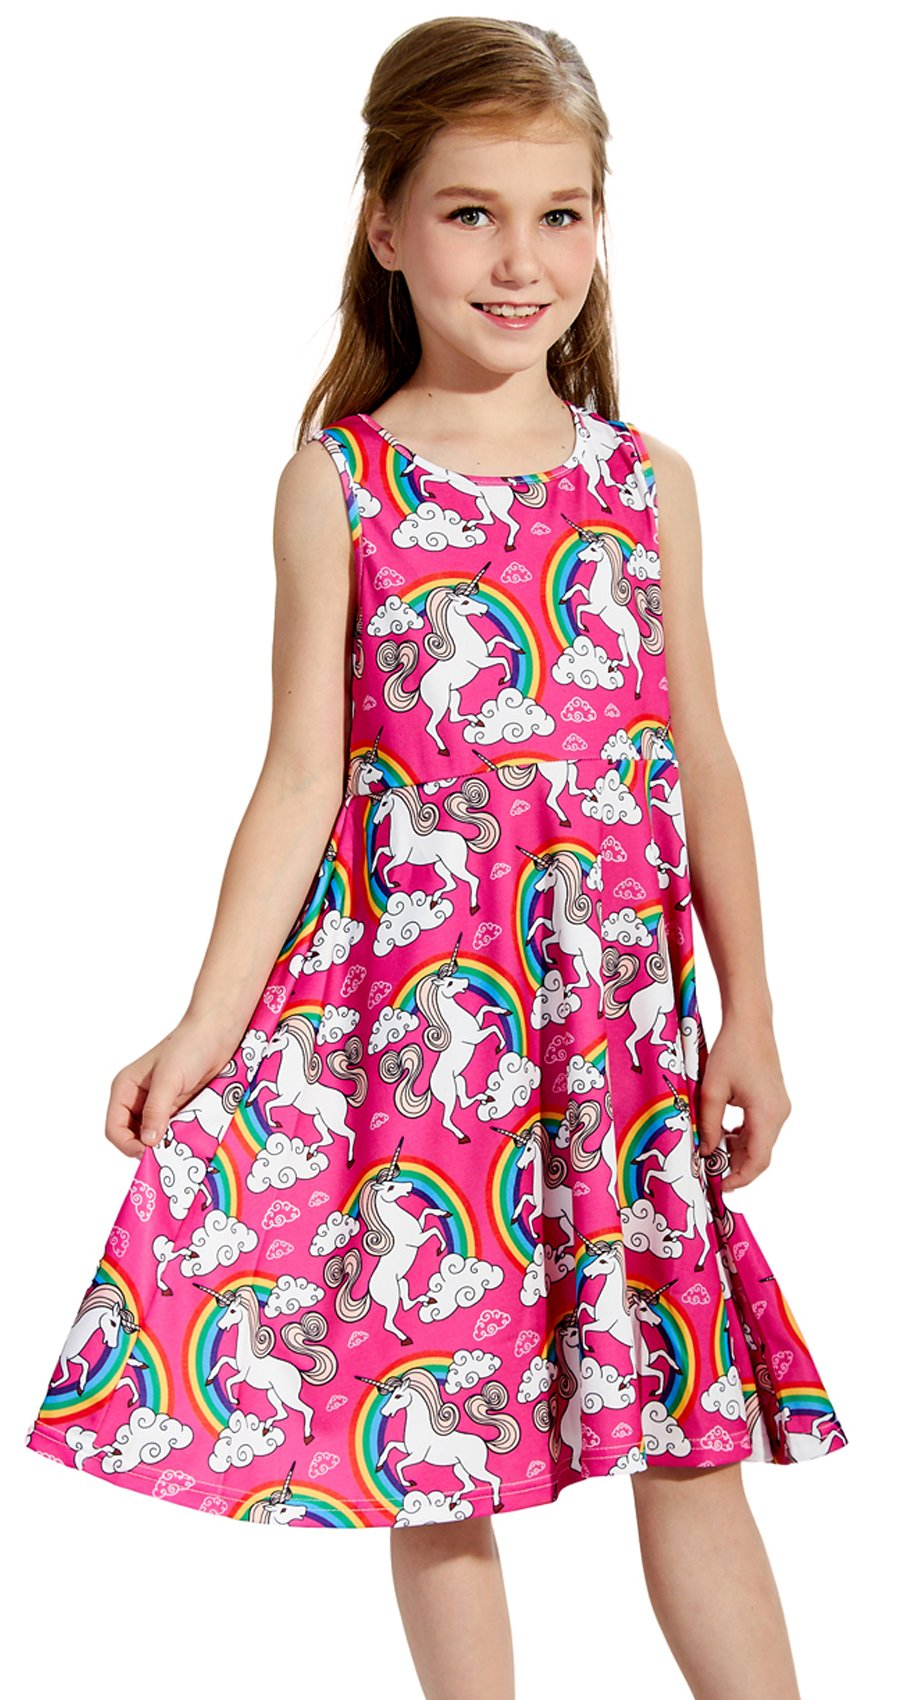 Juniors Dresses, Unicorn Dress Girls, Unicorn Gifts for Girls,Cloud Rainbow Sleeveless Dress for Little Girls Rose red (Unicorn Dress,M)